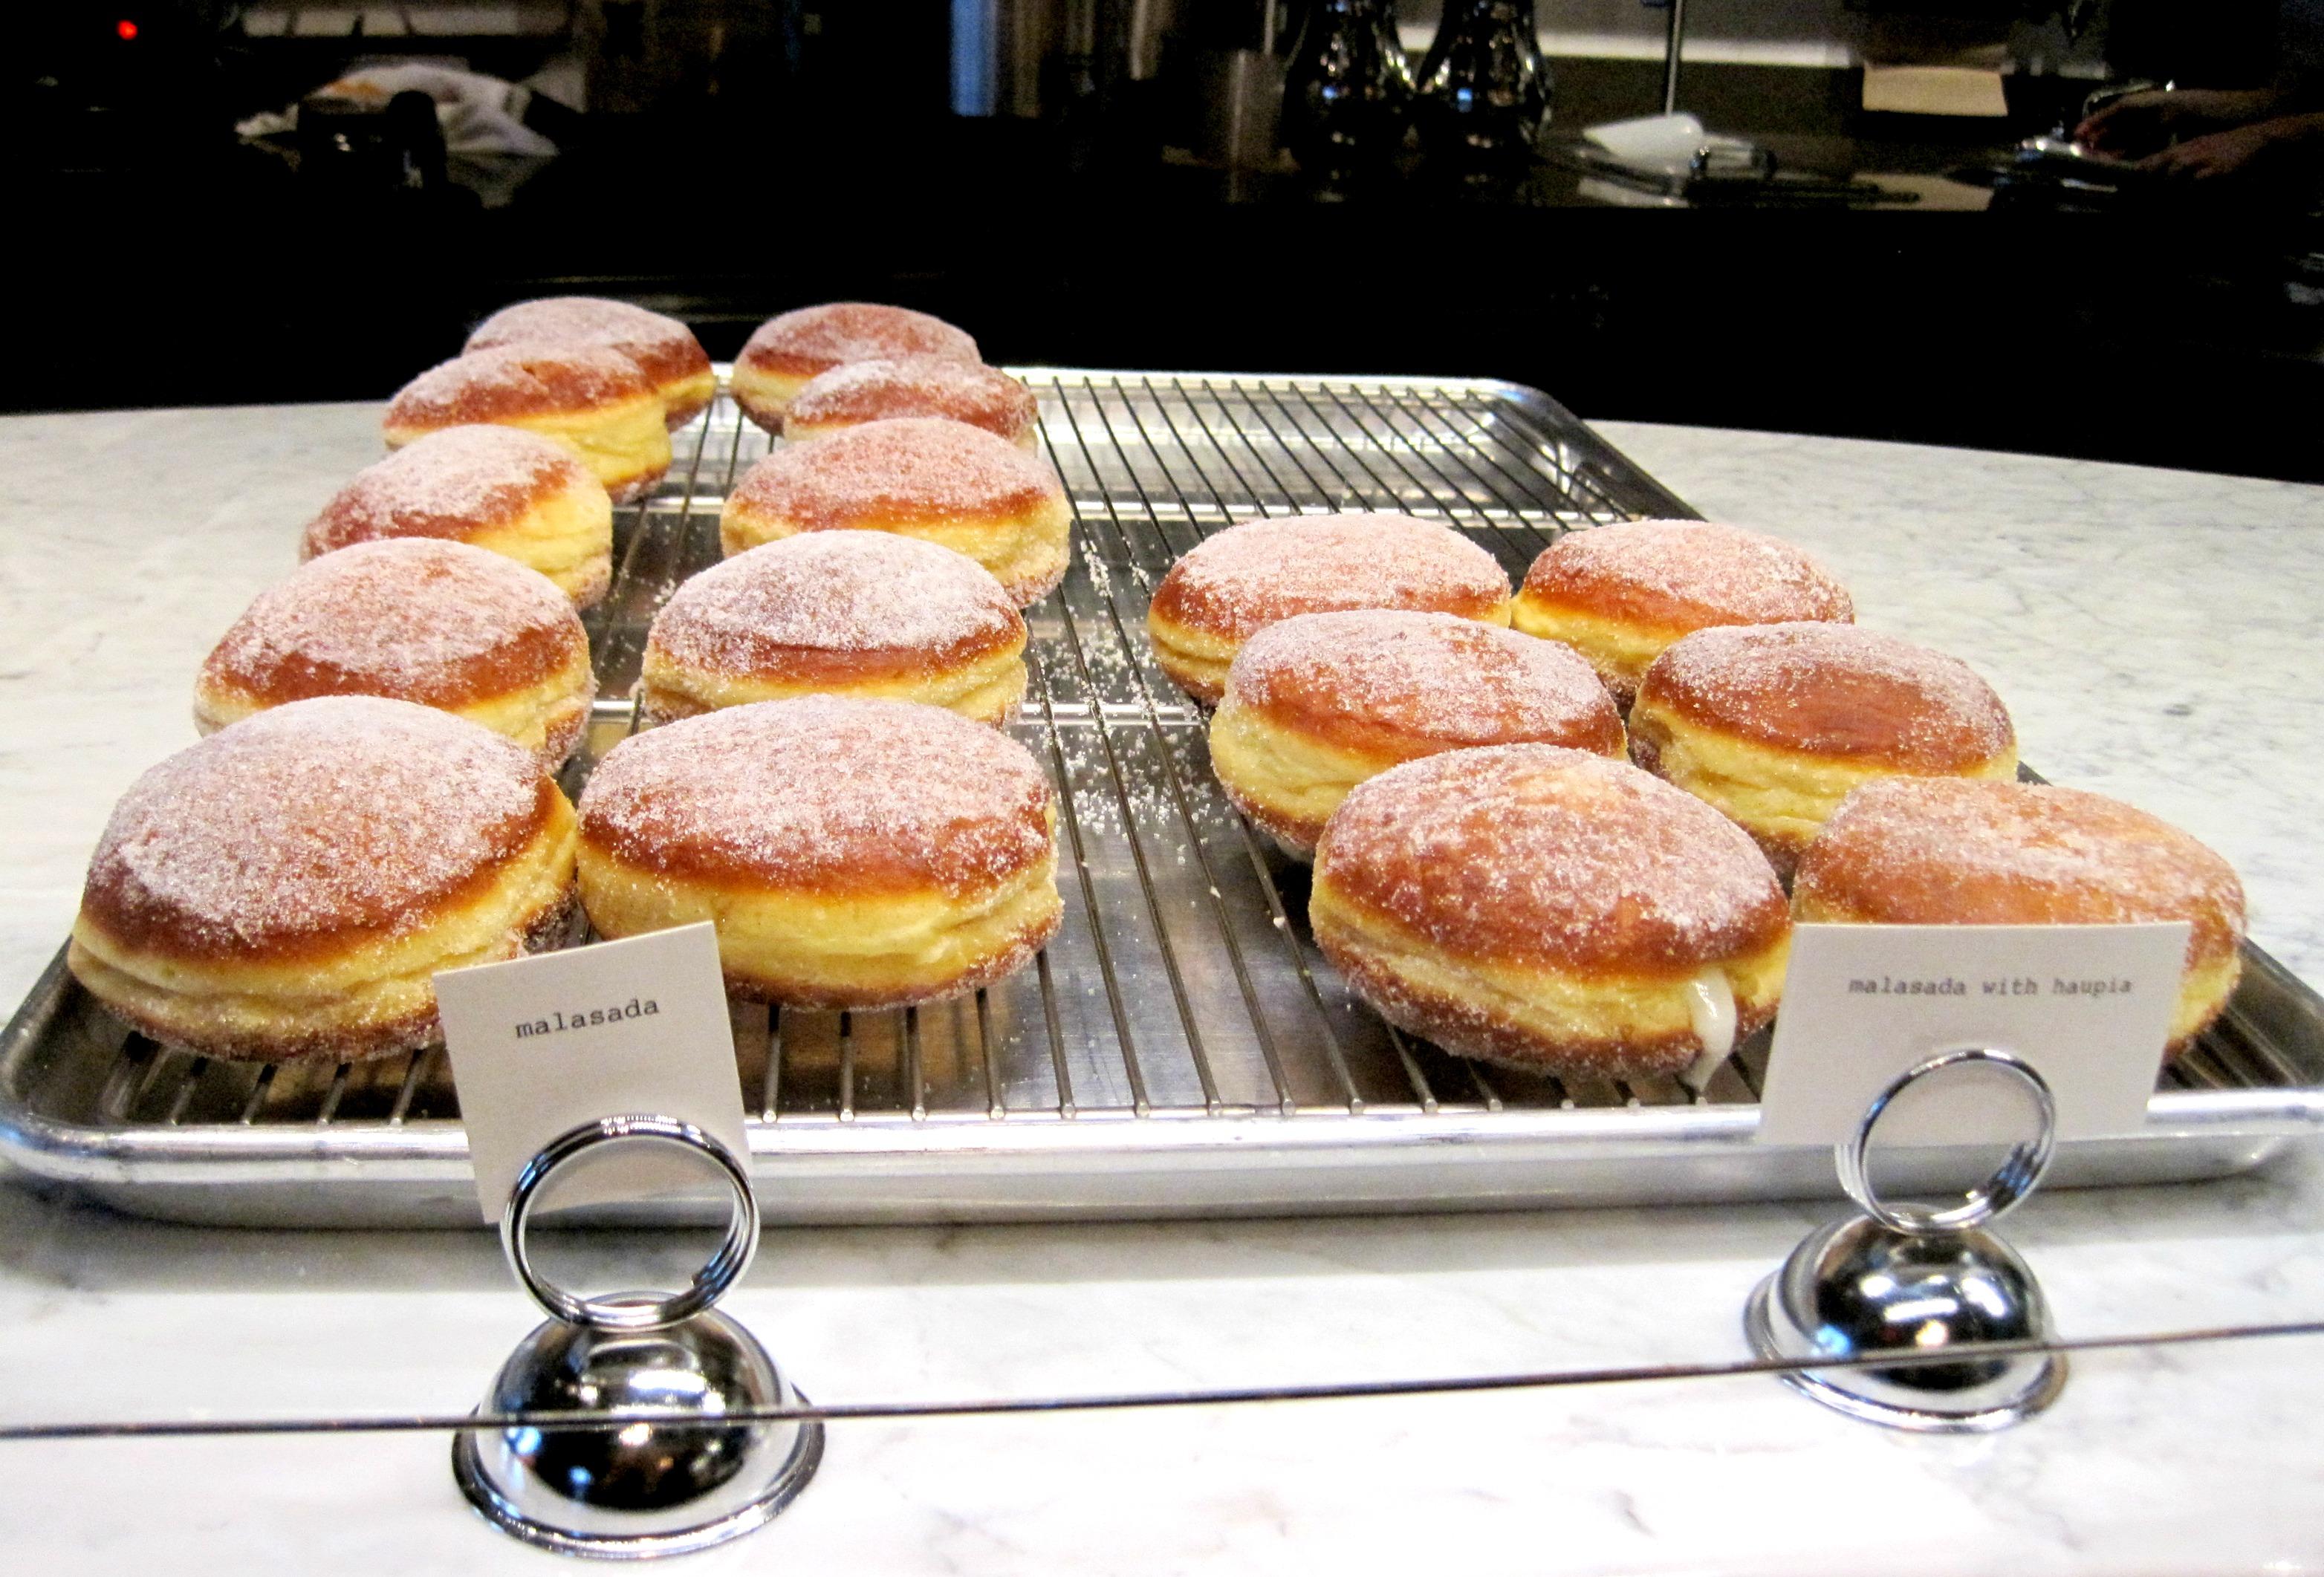 Sidecar doughnuts and coffee malsadas